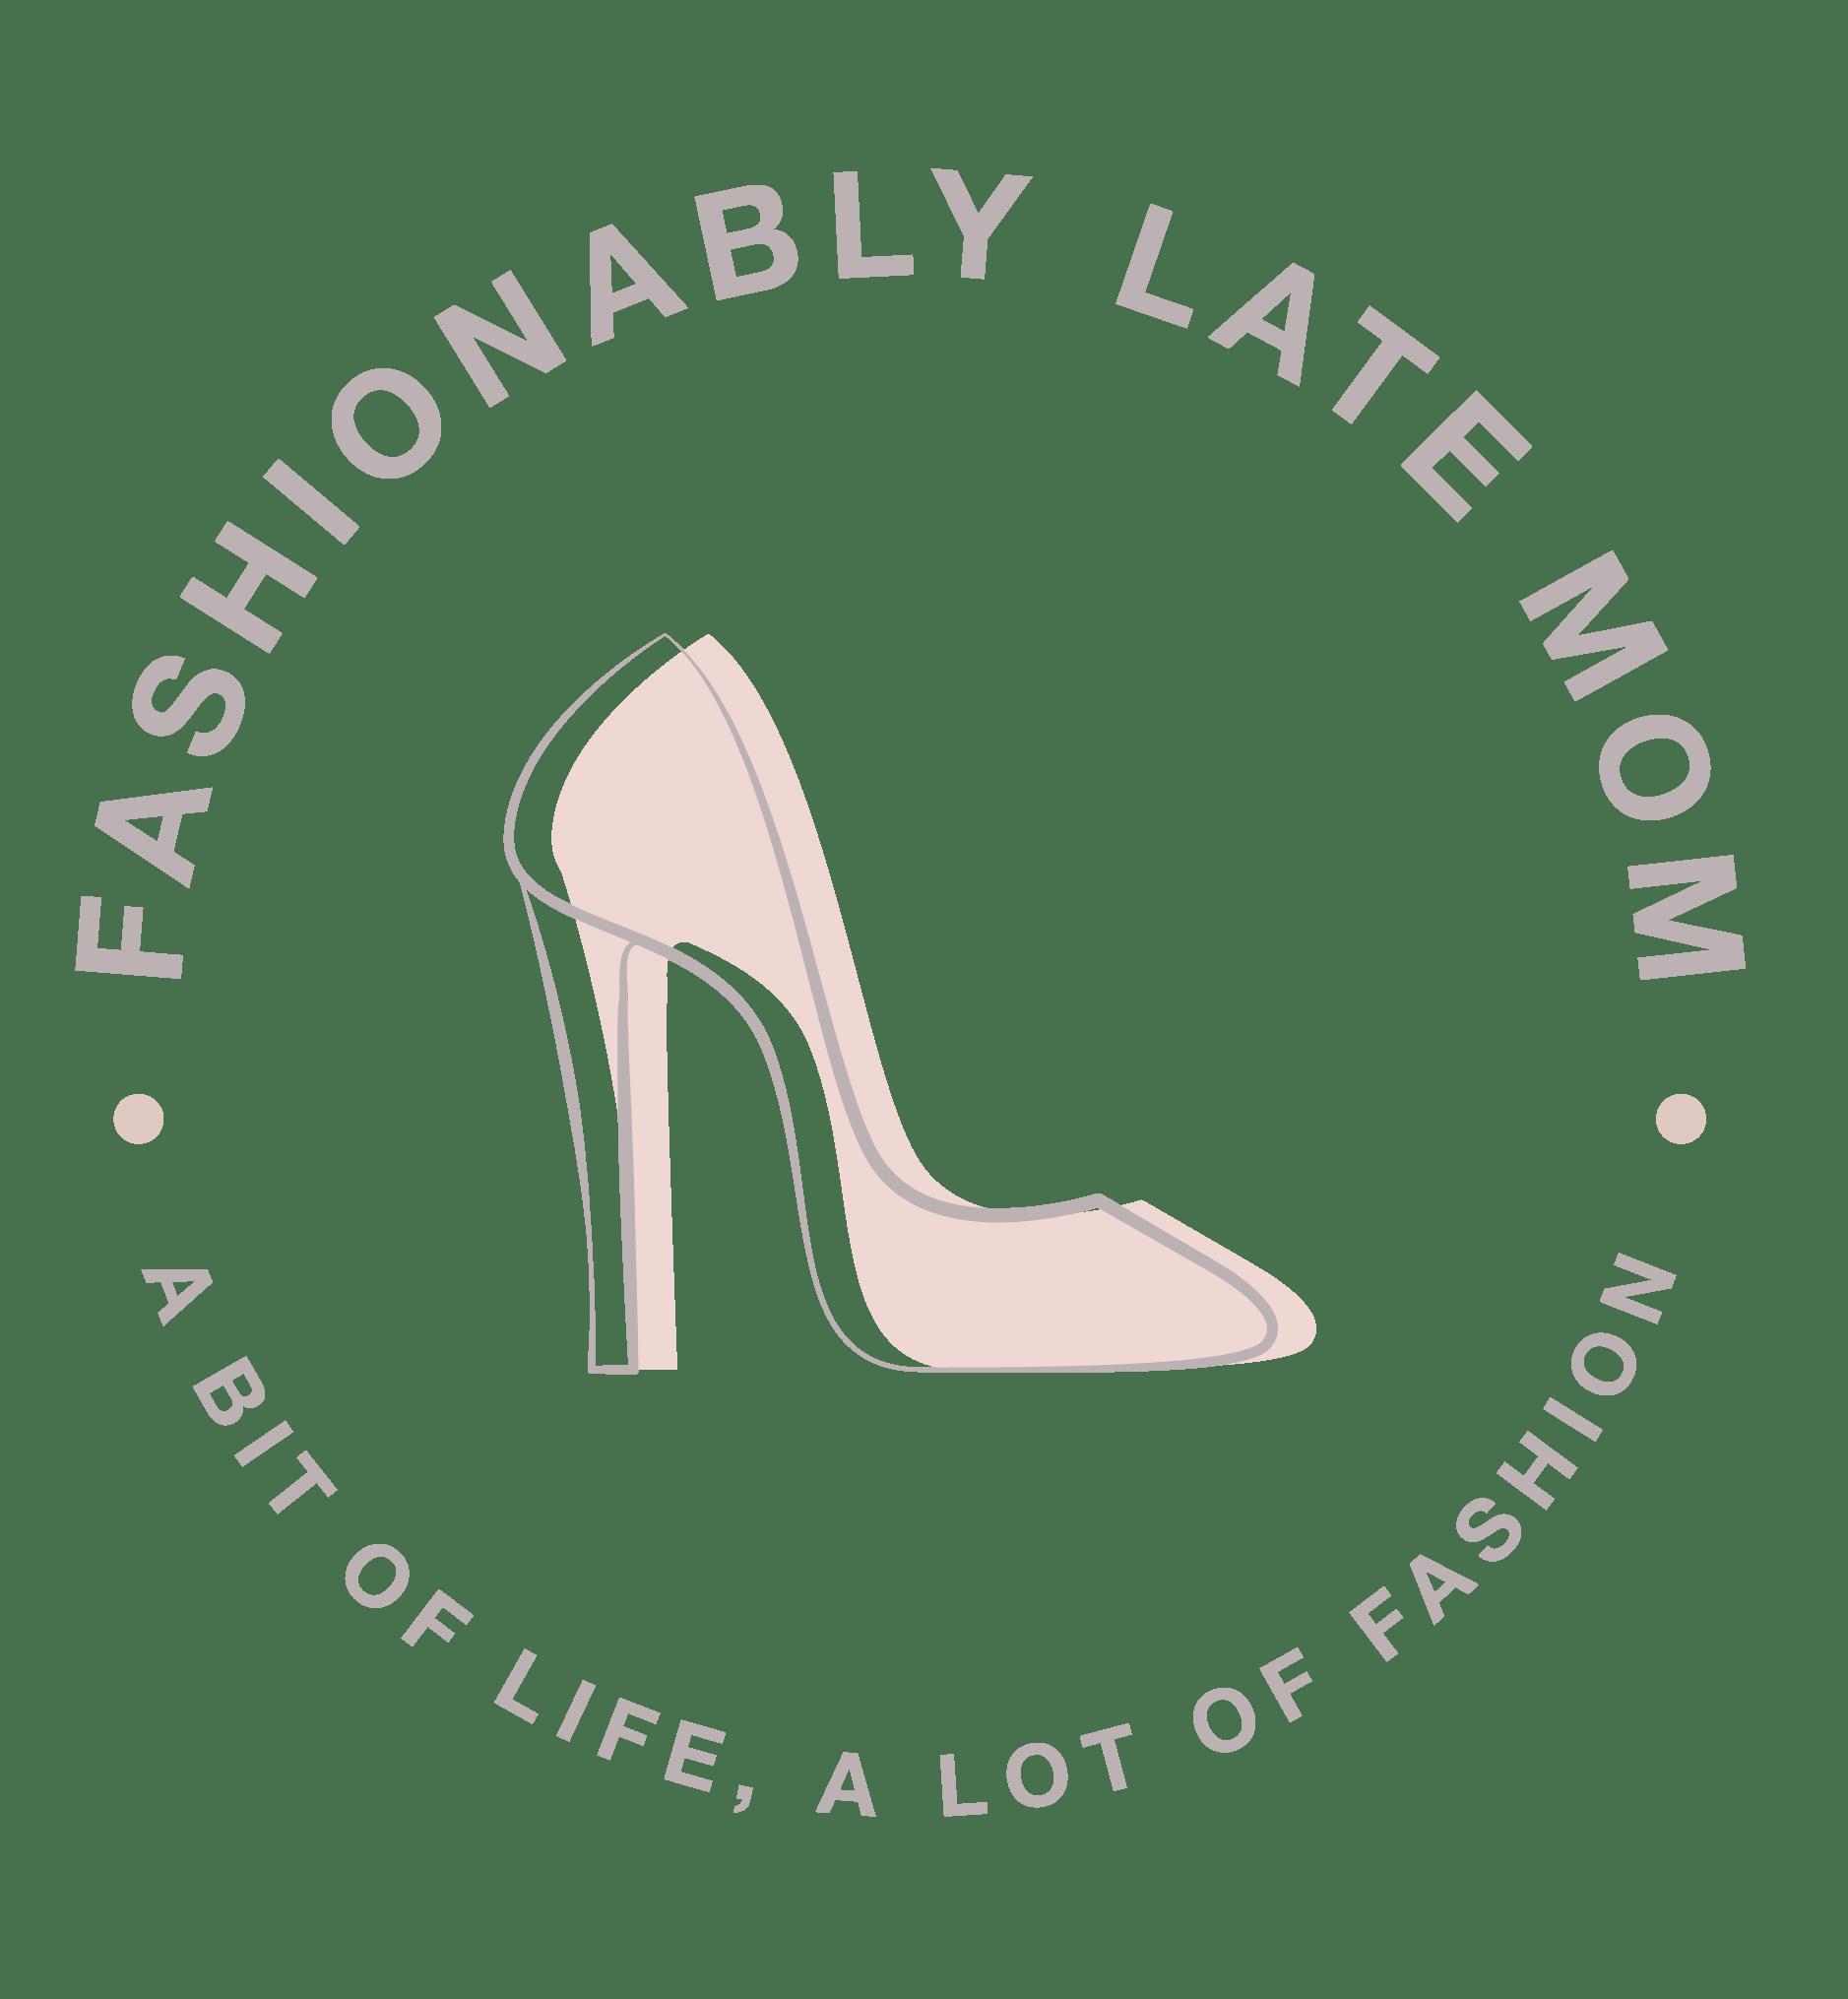 Fashionably Late Mom, a Top Pittsburgh mom fashion blog